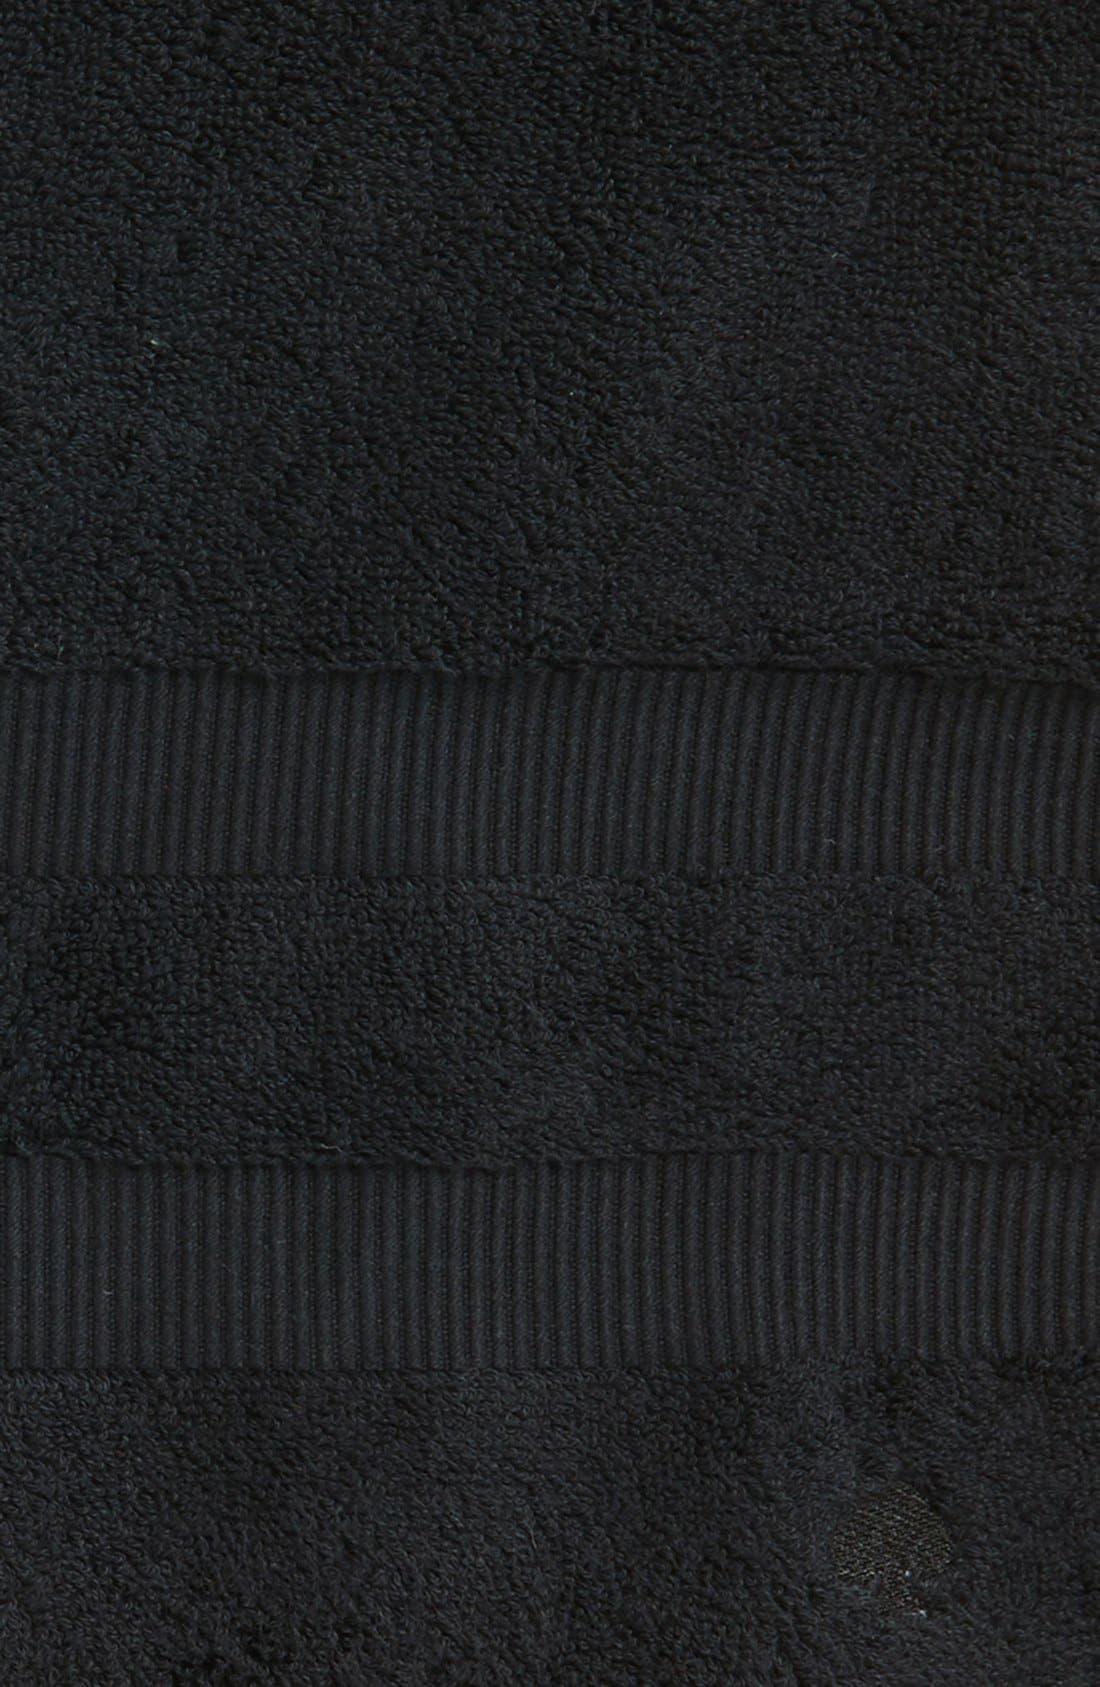 'chattam stripe' bath towel,                             Alternate thumbnail 2, color,                             BLACK